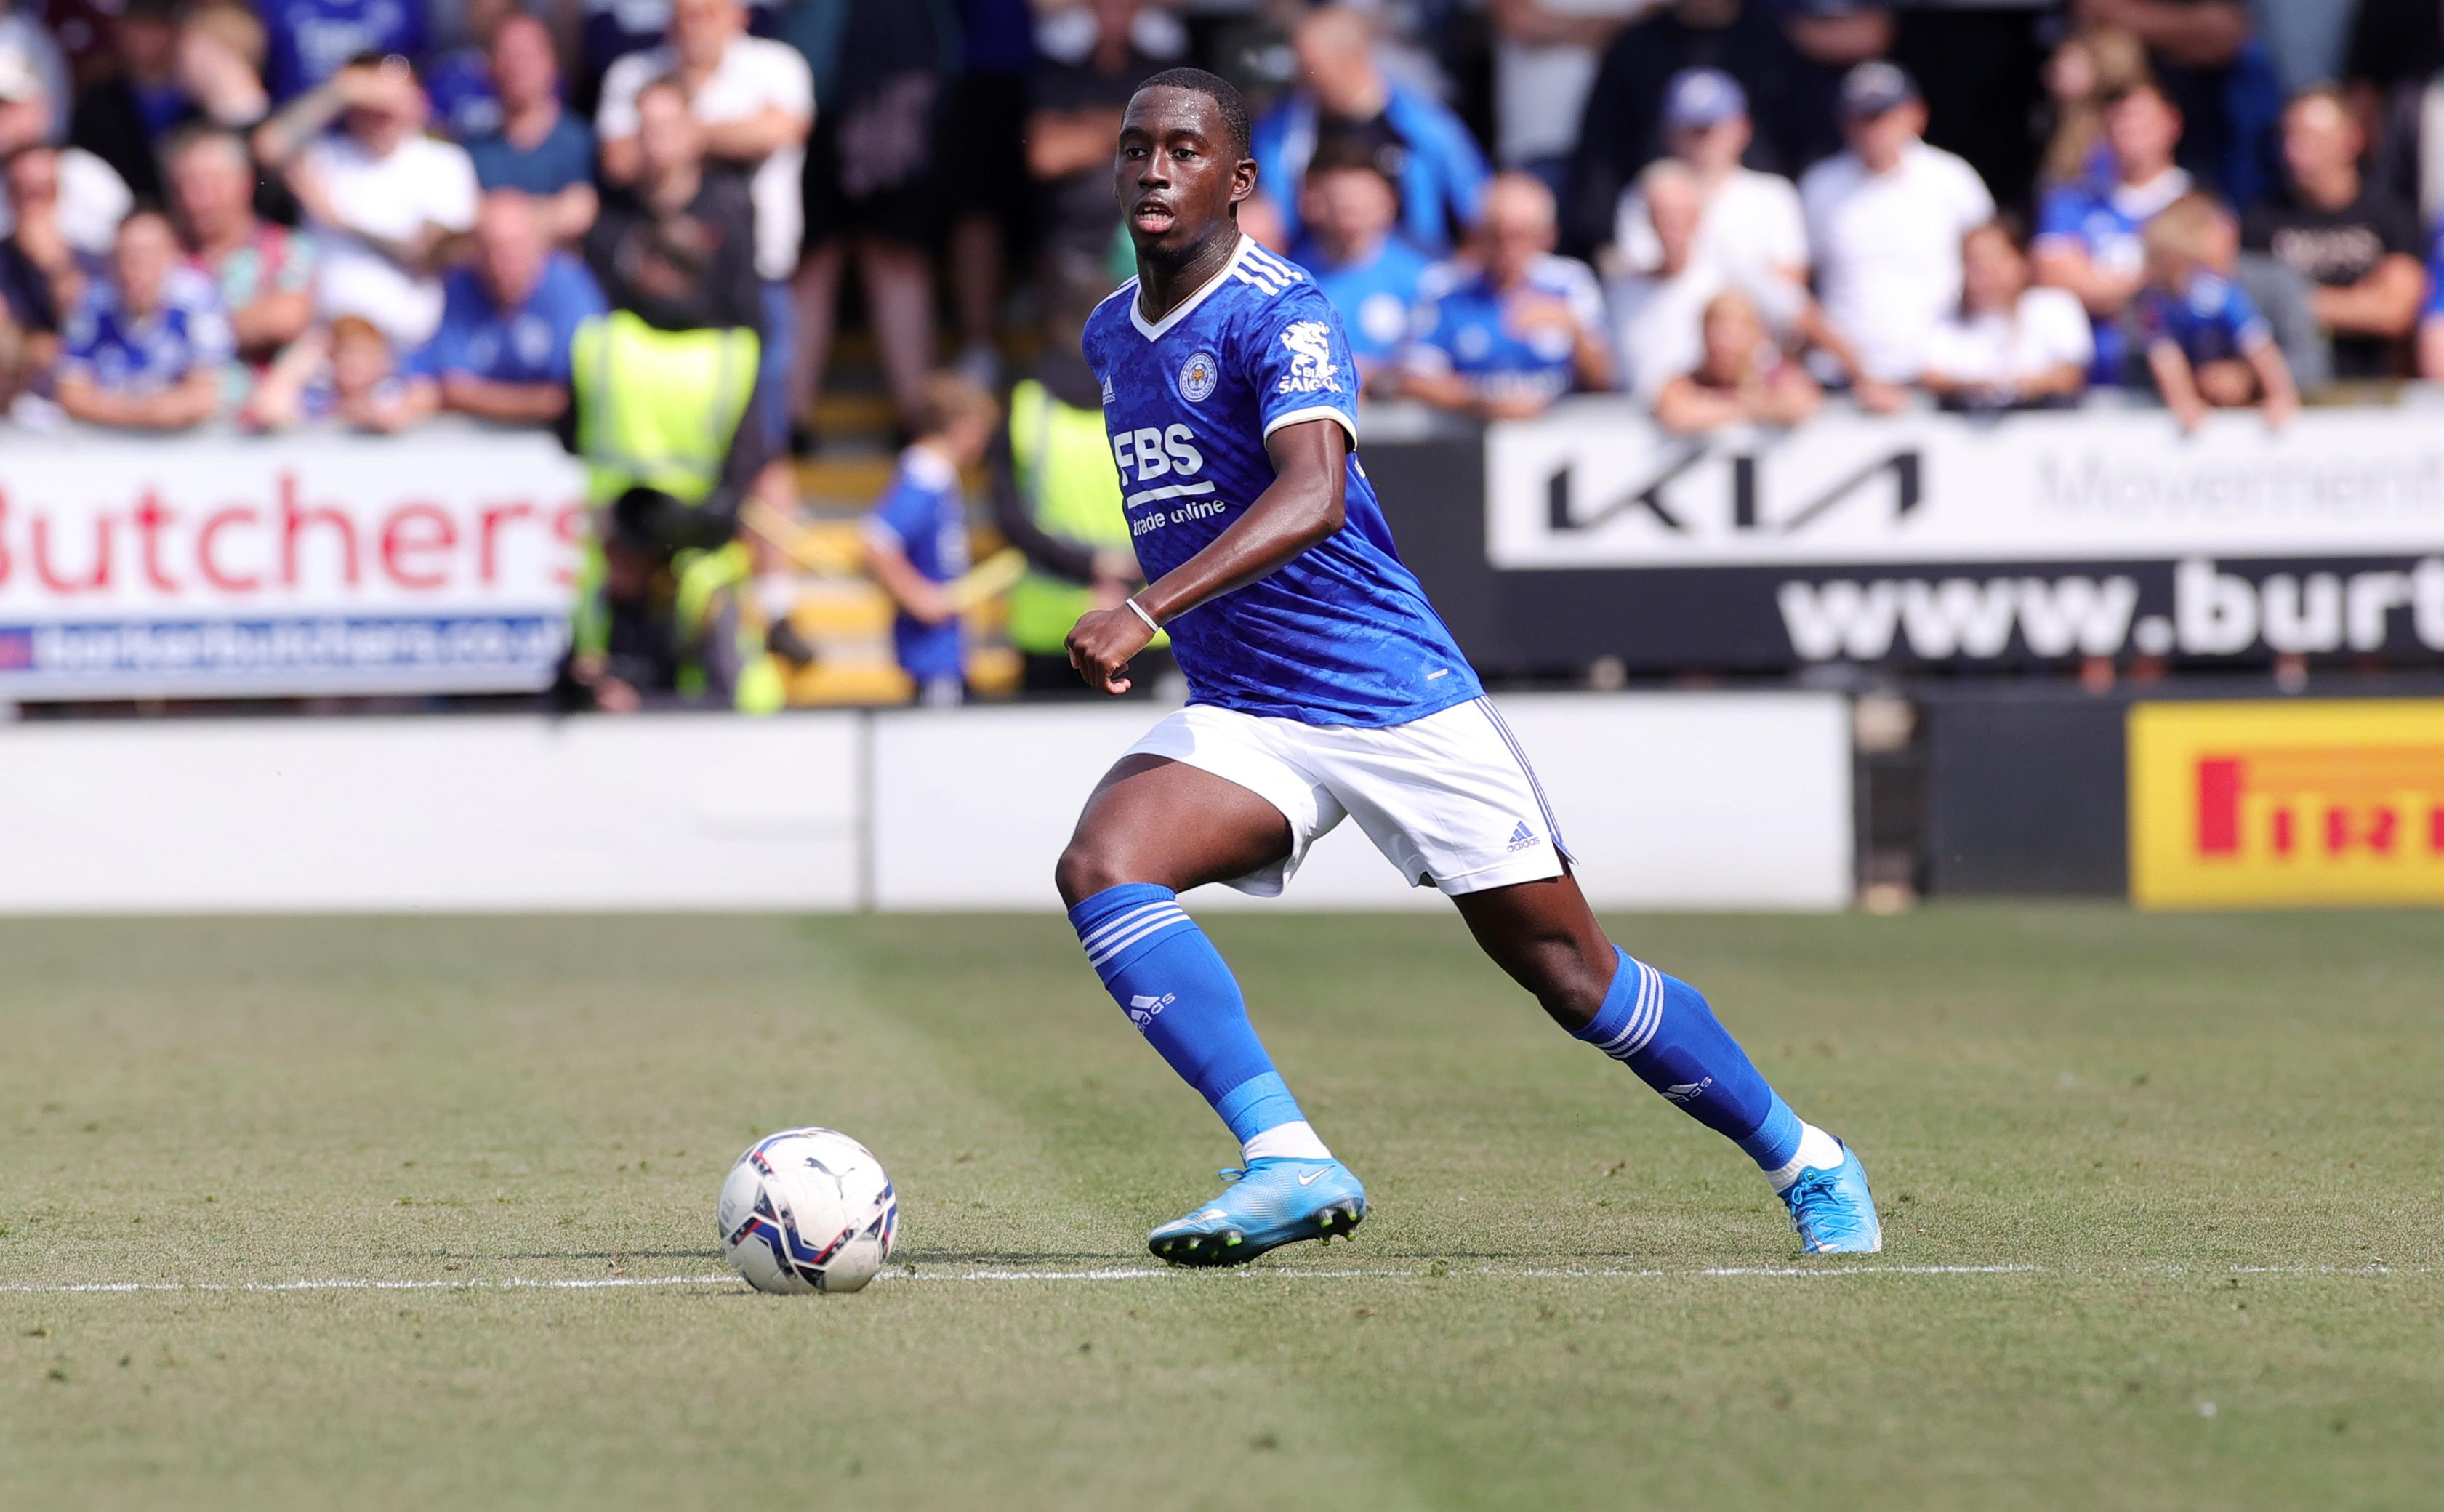 Leicester's 2021/22 Pre-Season Begins In Burton